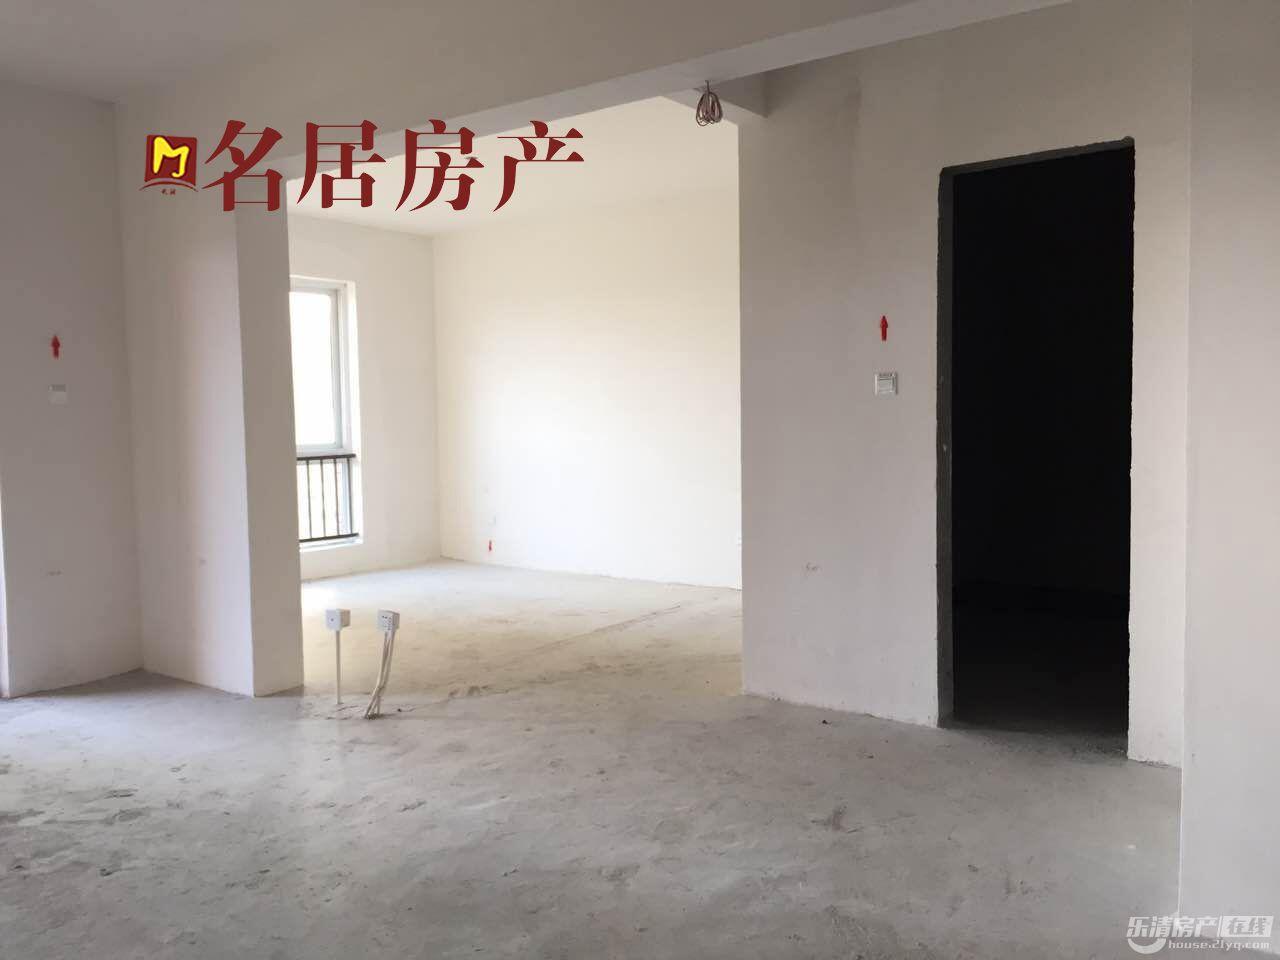 http://house.21yq.com/userfiles/image/20161209/09141417da38d63a9d0201.jpg